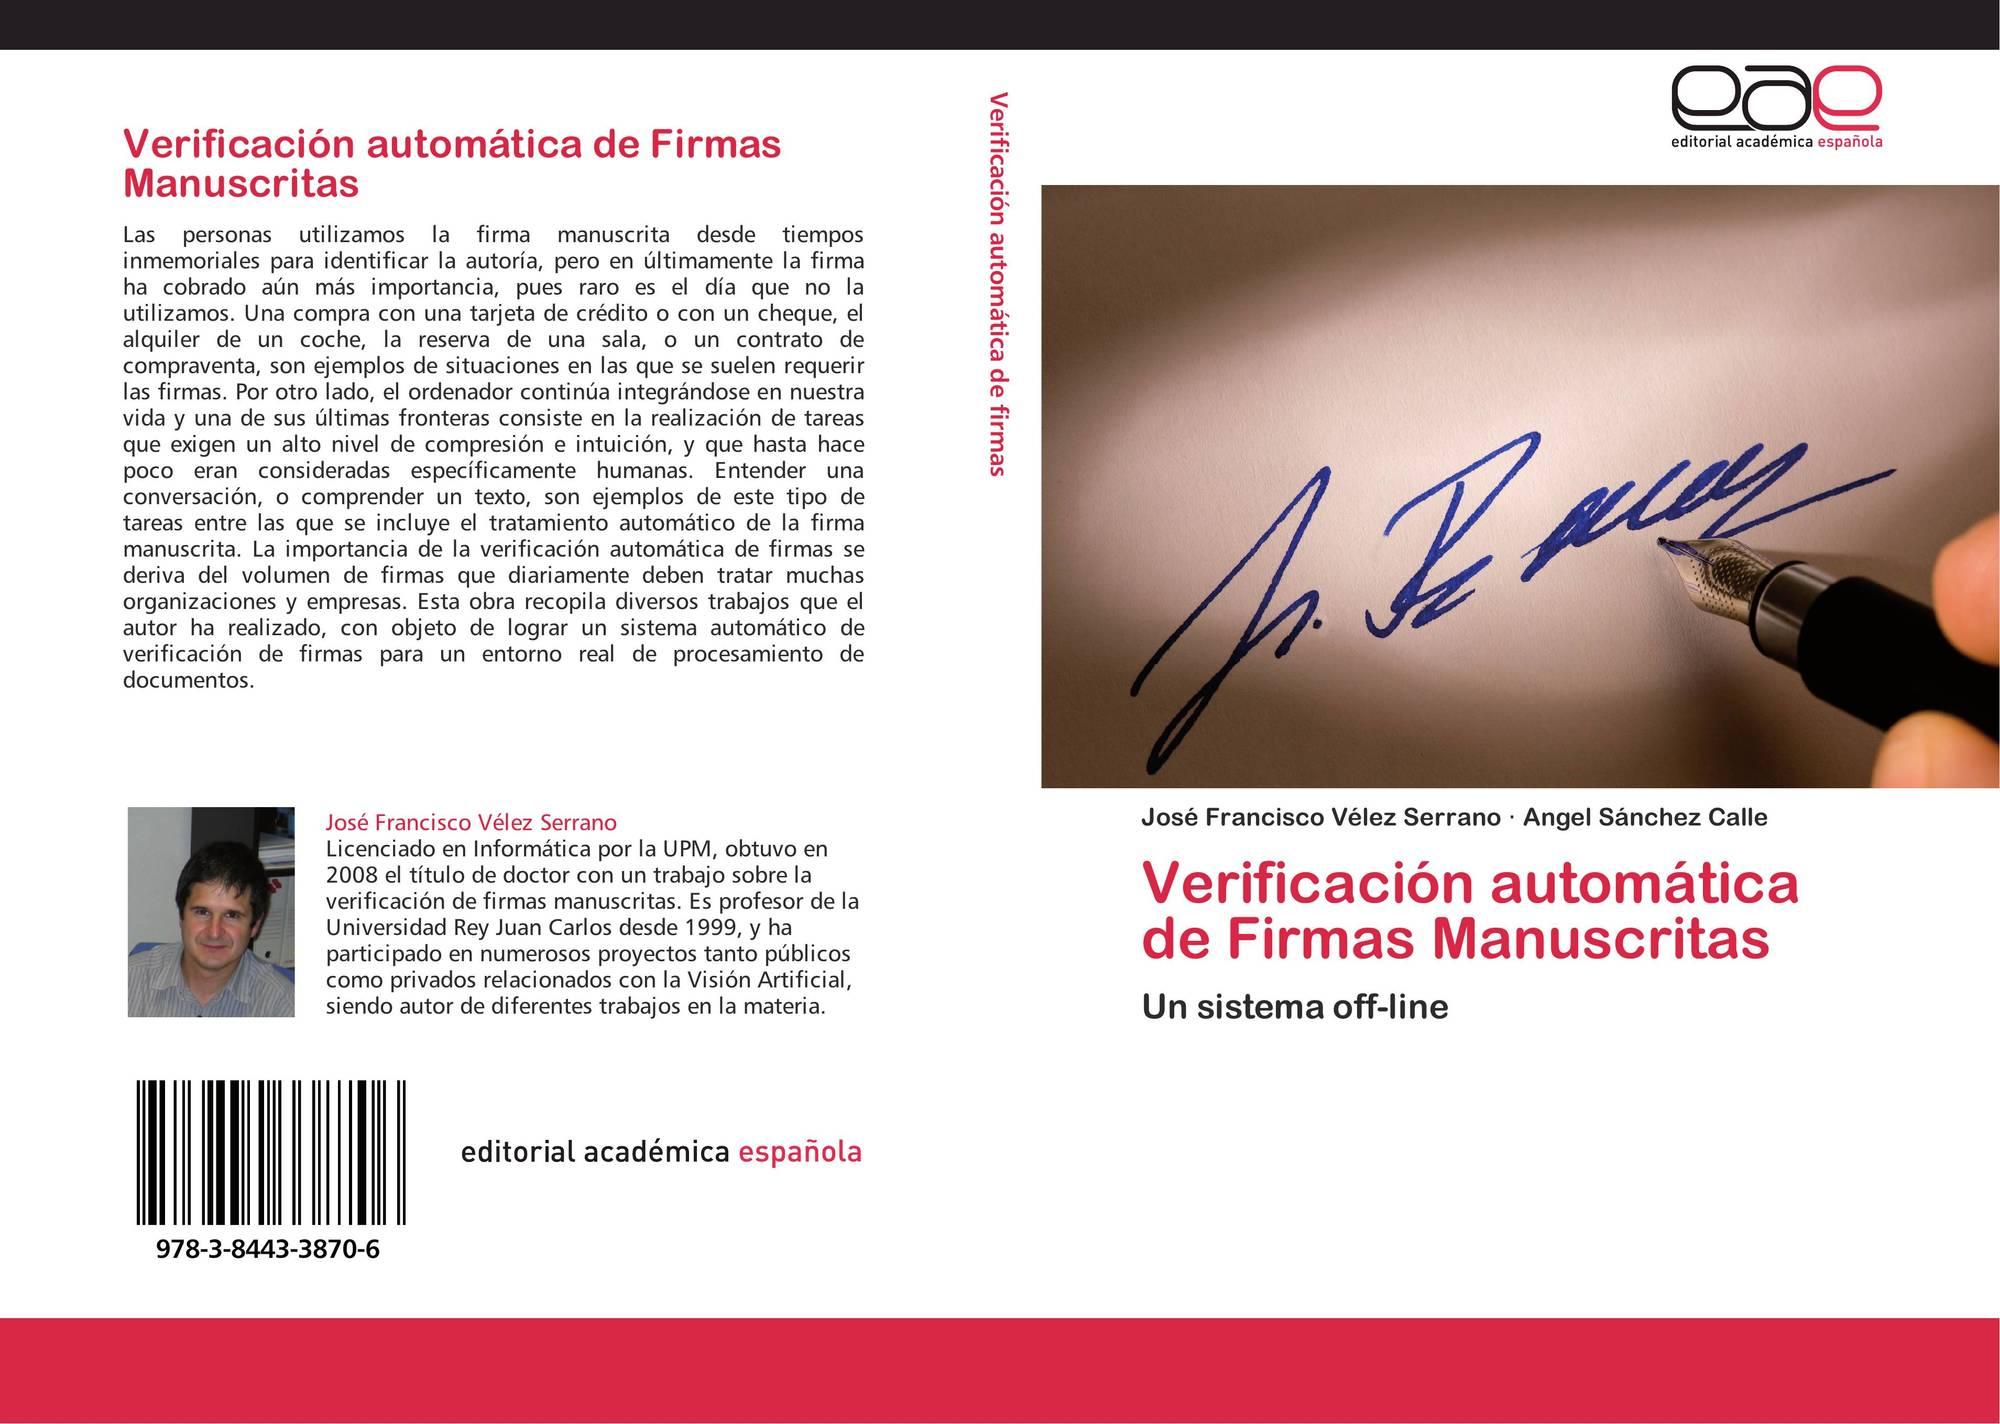 Verificación automática de Firmas Manuscritas, 978-3-8443-3870-6 ...